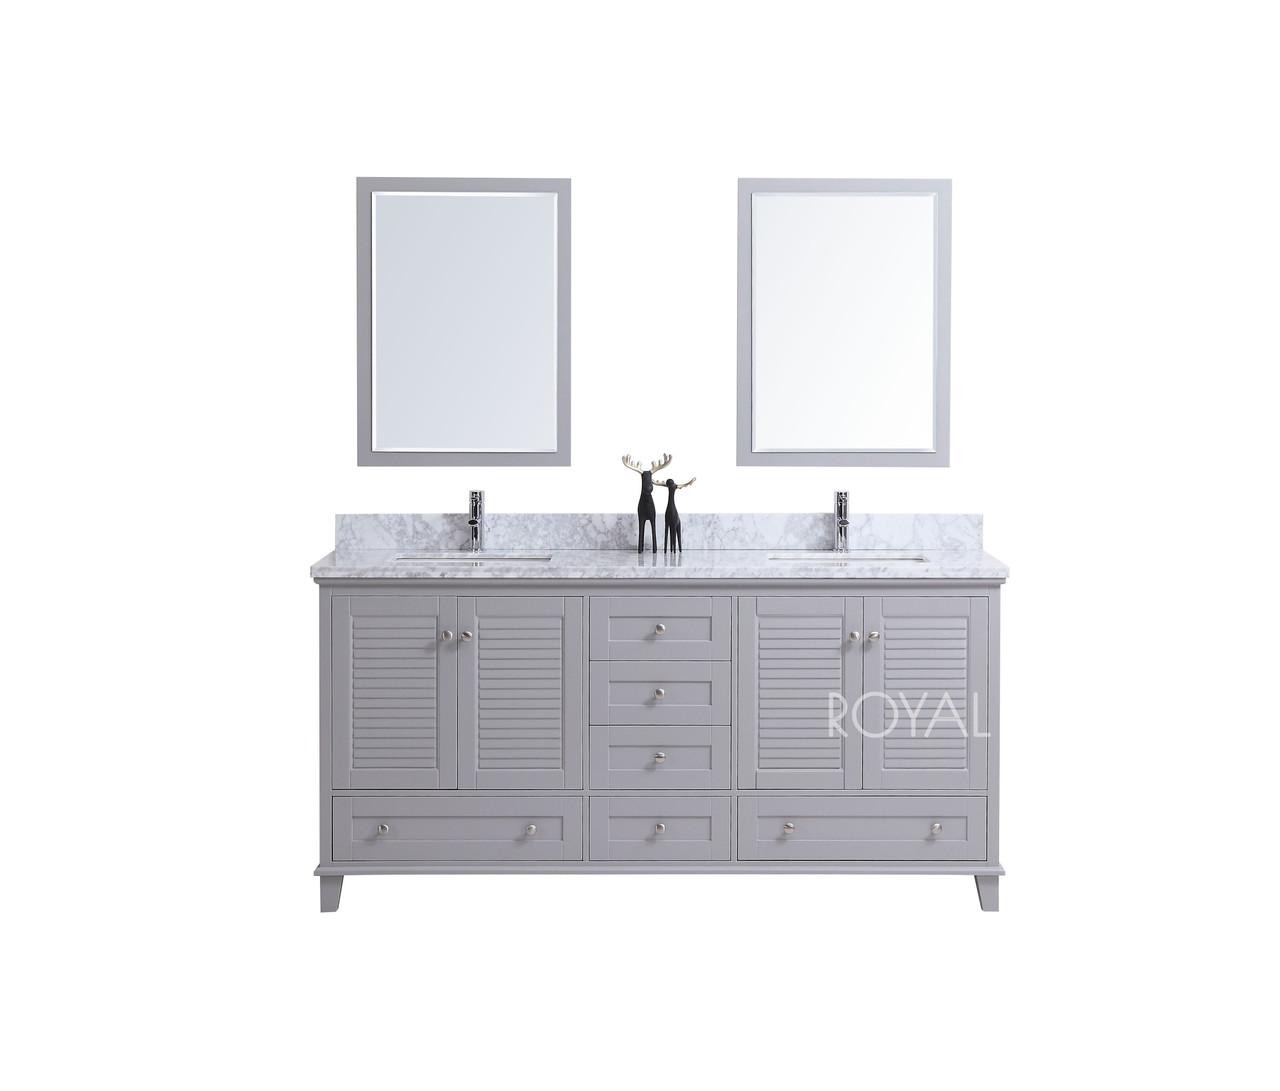 Keyes 72 Inch Gray Double Sink Bathroom Vanity Top Included Royal Bath Place